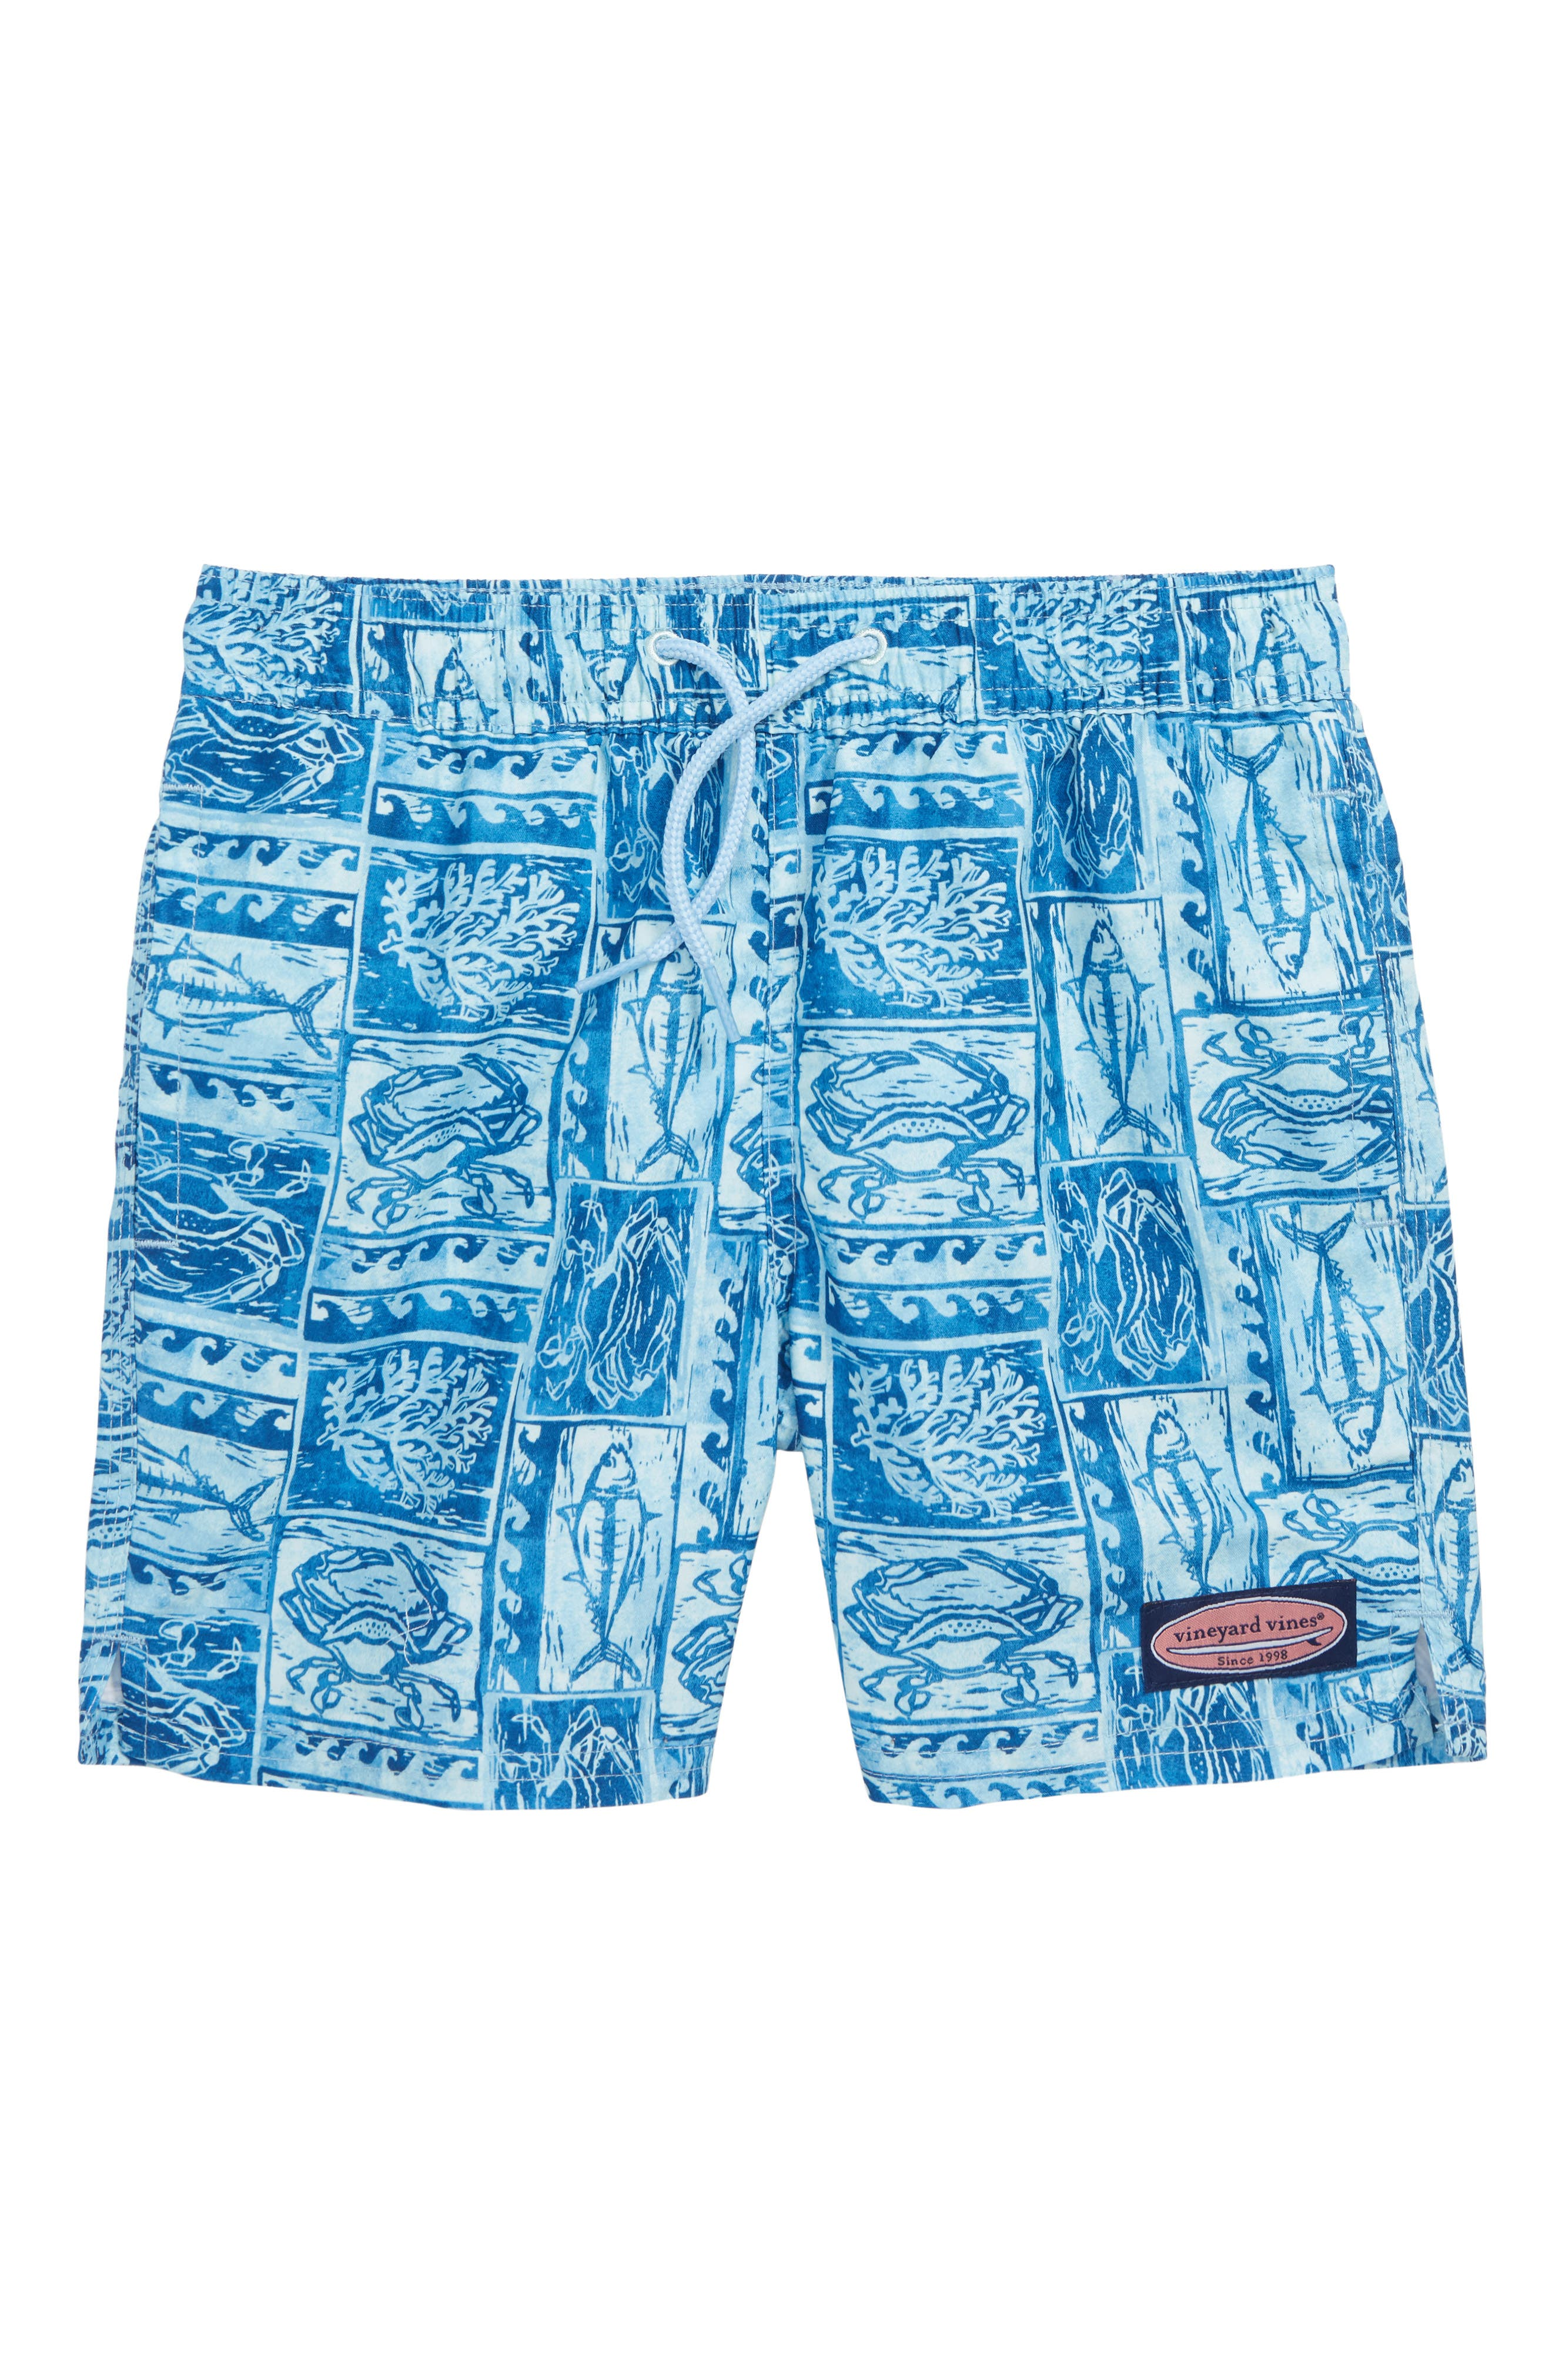 Woodblock Sea Life Chappy Swim Trunks,                             Main thumbnail 1, color,                             JAKE BLUE